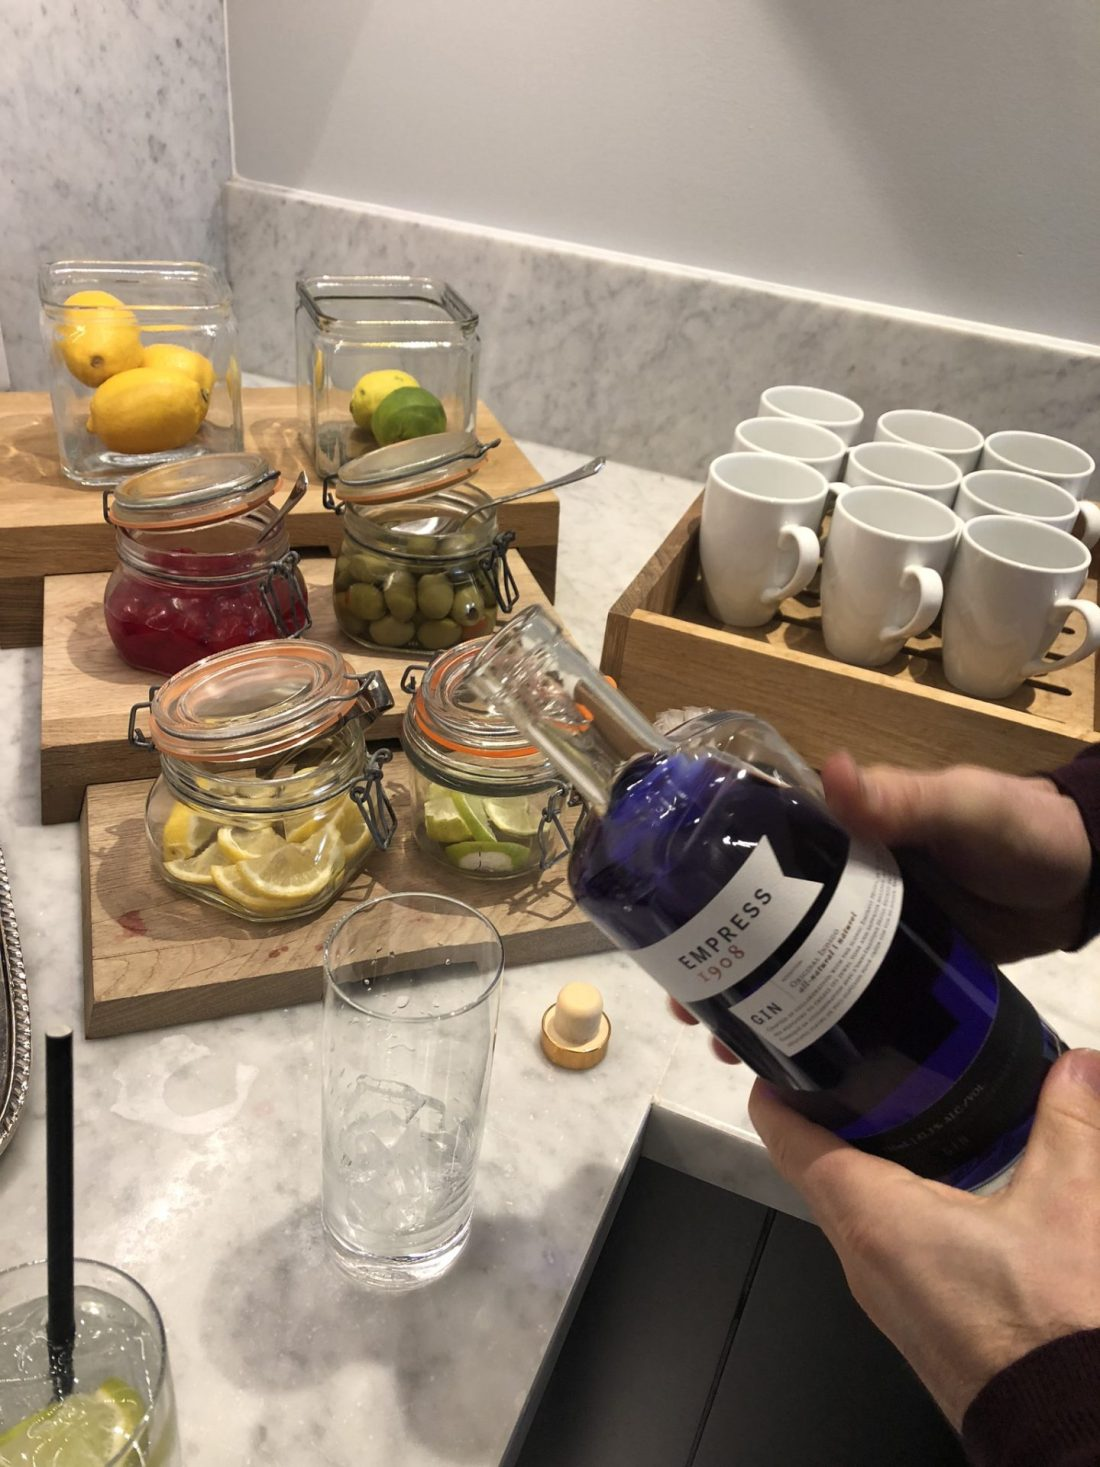 Empress indigo gin in the Fairmont Empress Gold Lounge, Victoria